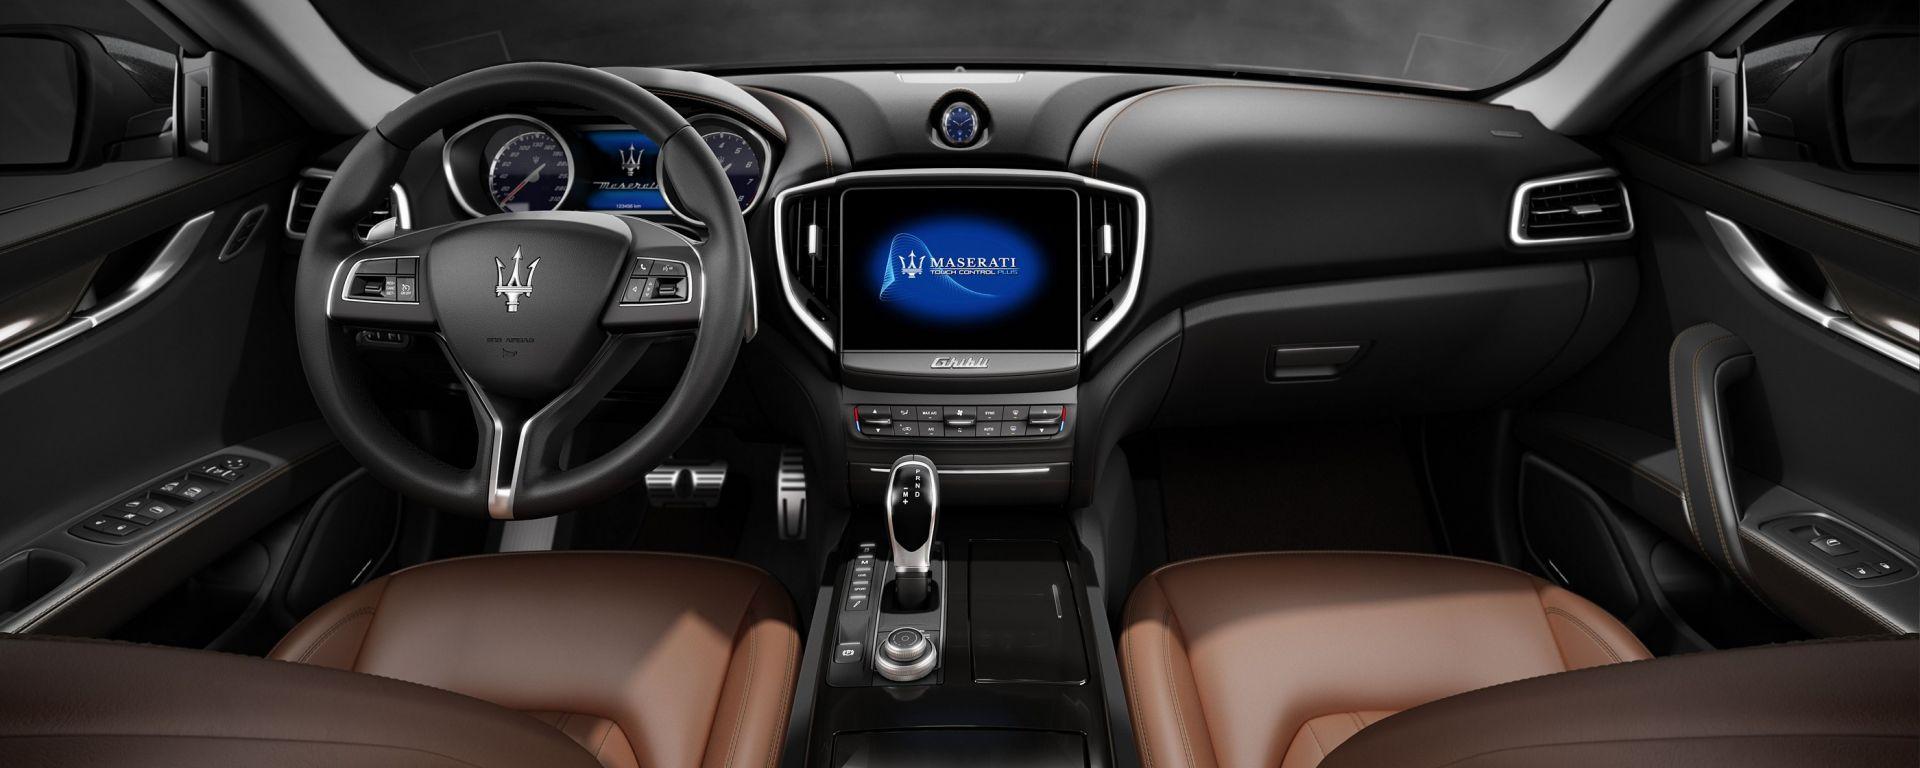 Maserati Ghibli 2017: il restyling al Salone di Parigi